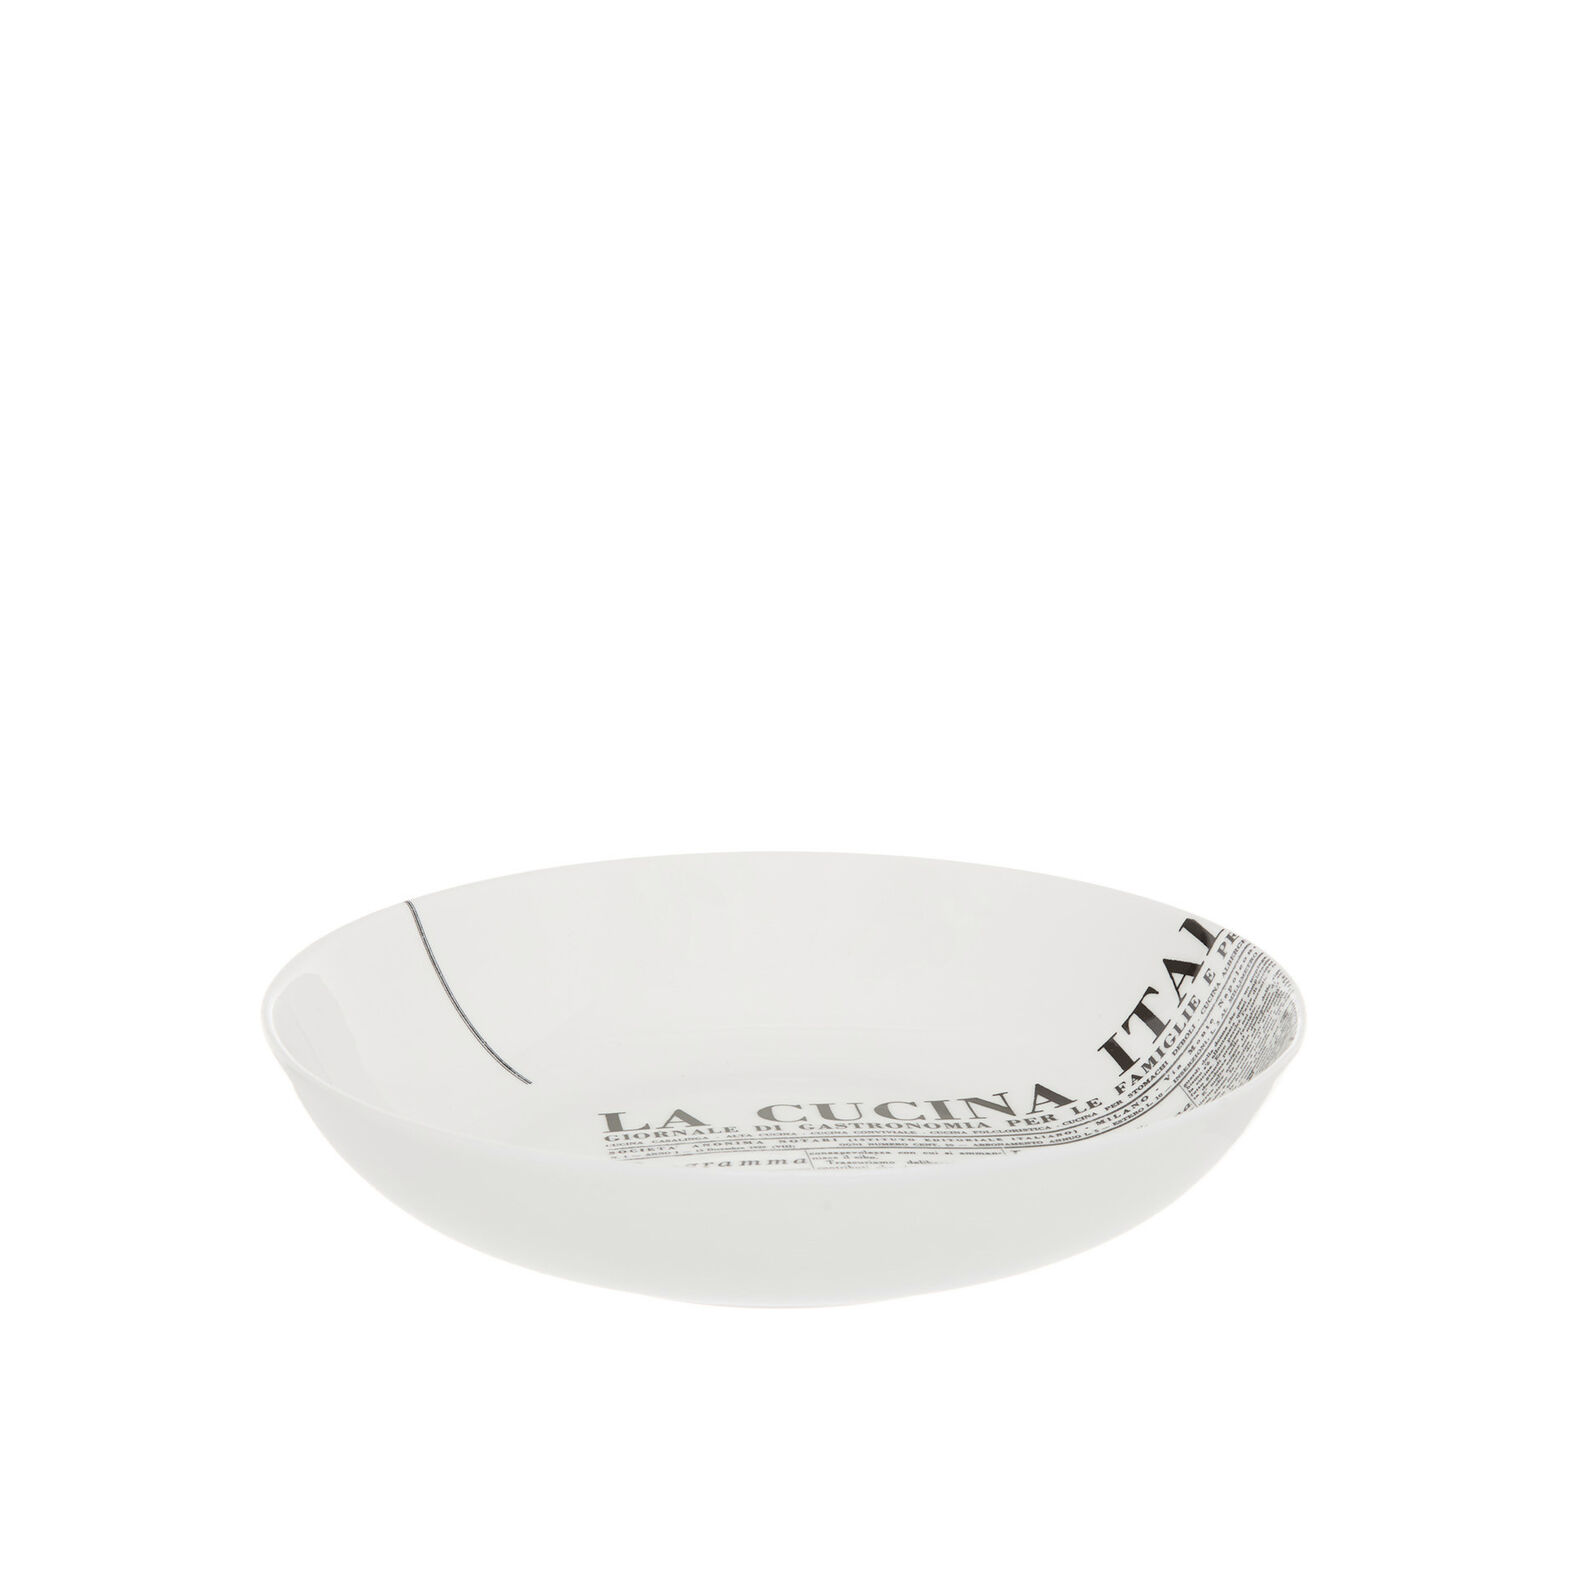 Fine bone china soup dish with geometric La Cucina Italiana decoration